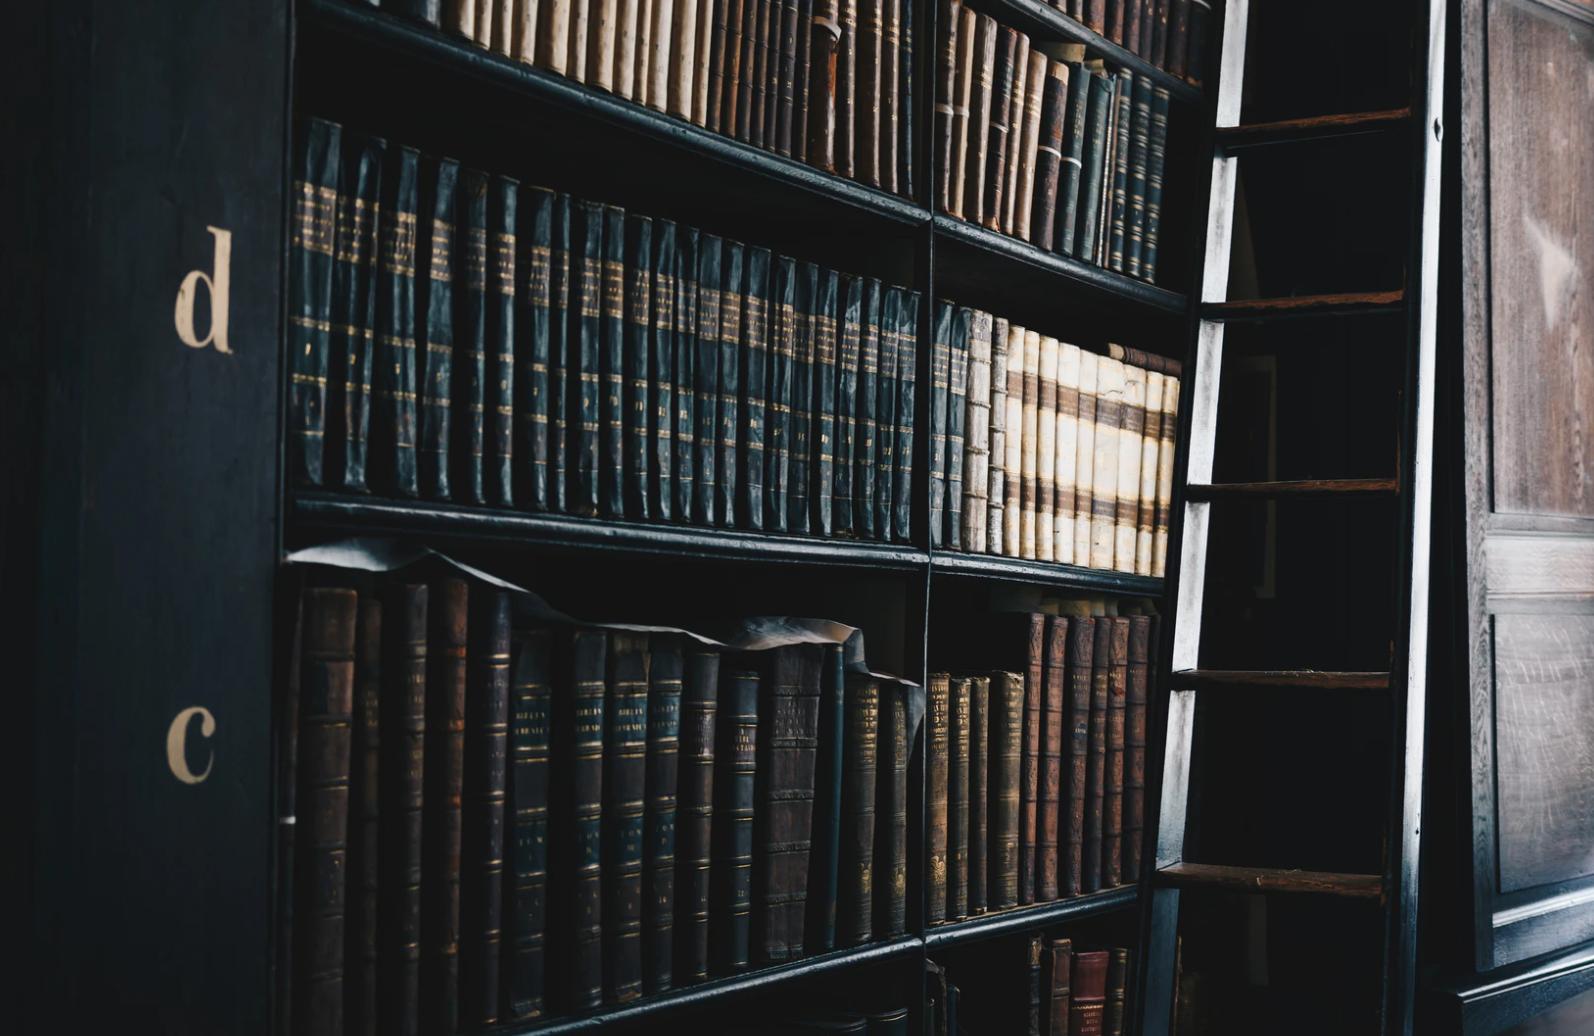 Consulenze Legali digitali app e siti we